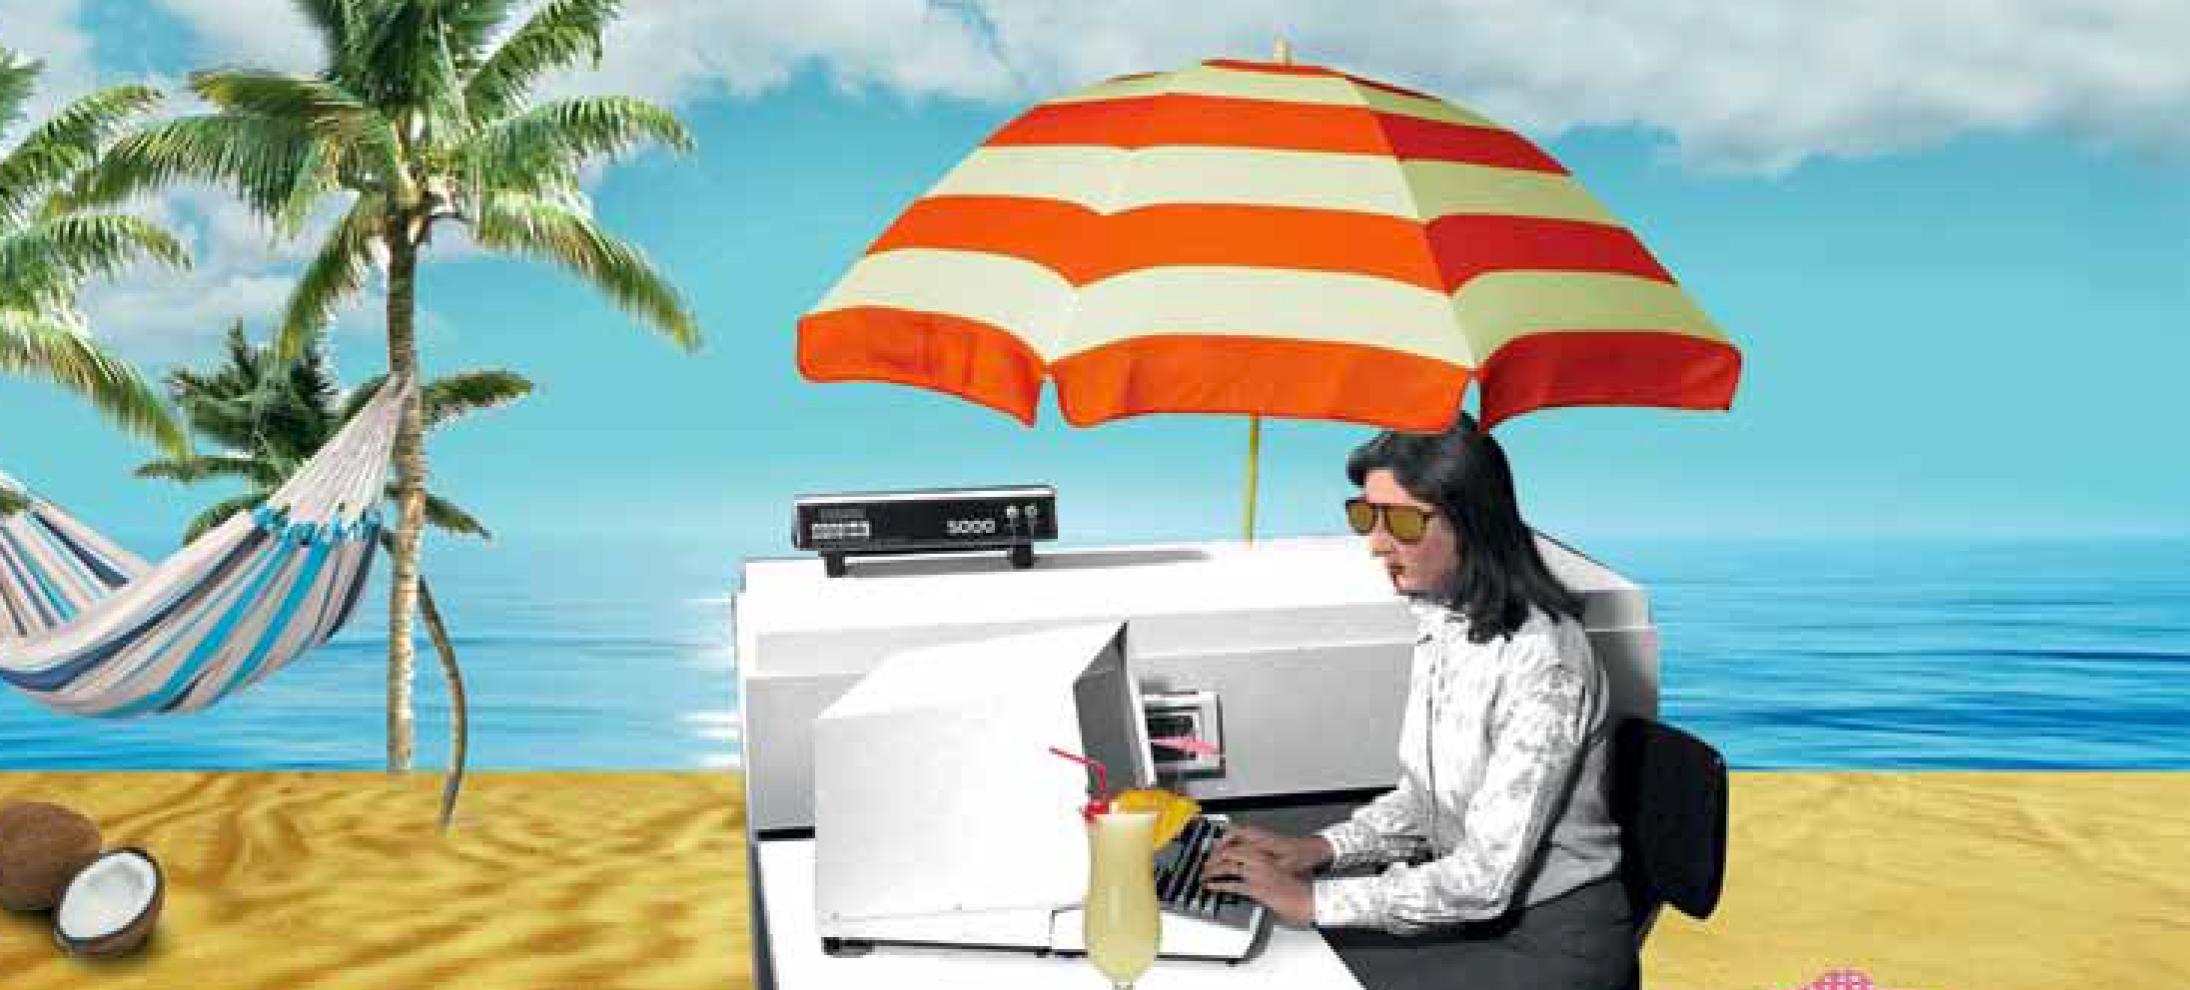 illustration-modernite-manageriale